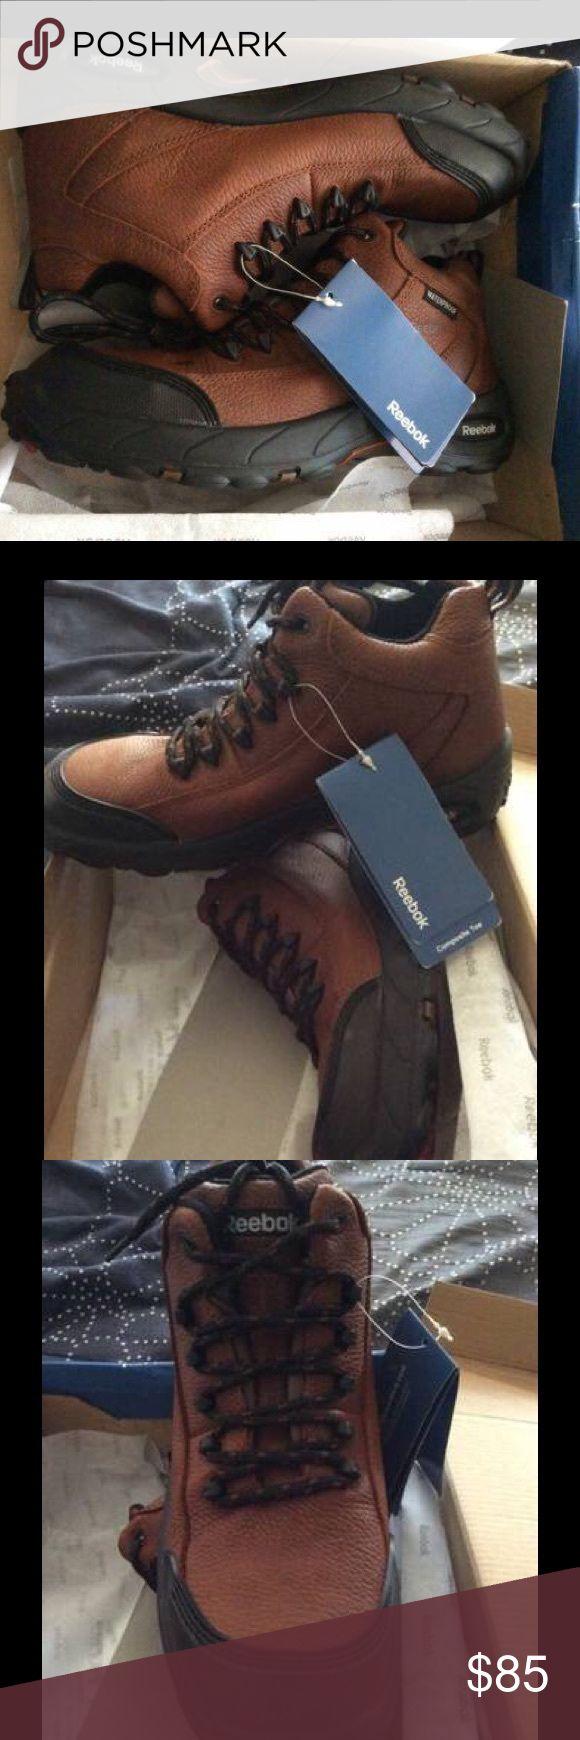 Reebok Composite Toe Boots New waterproof leather Composite Toe safety boots Reebok Shoes Boots